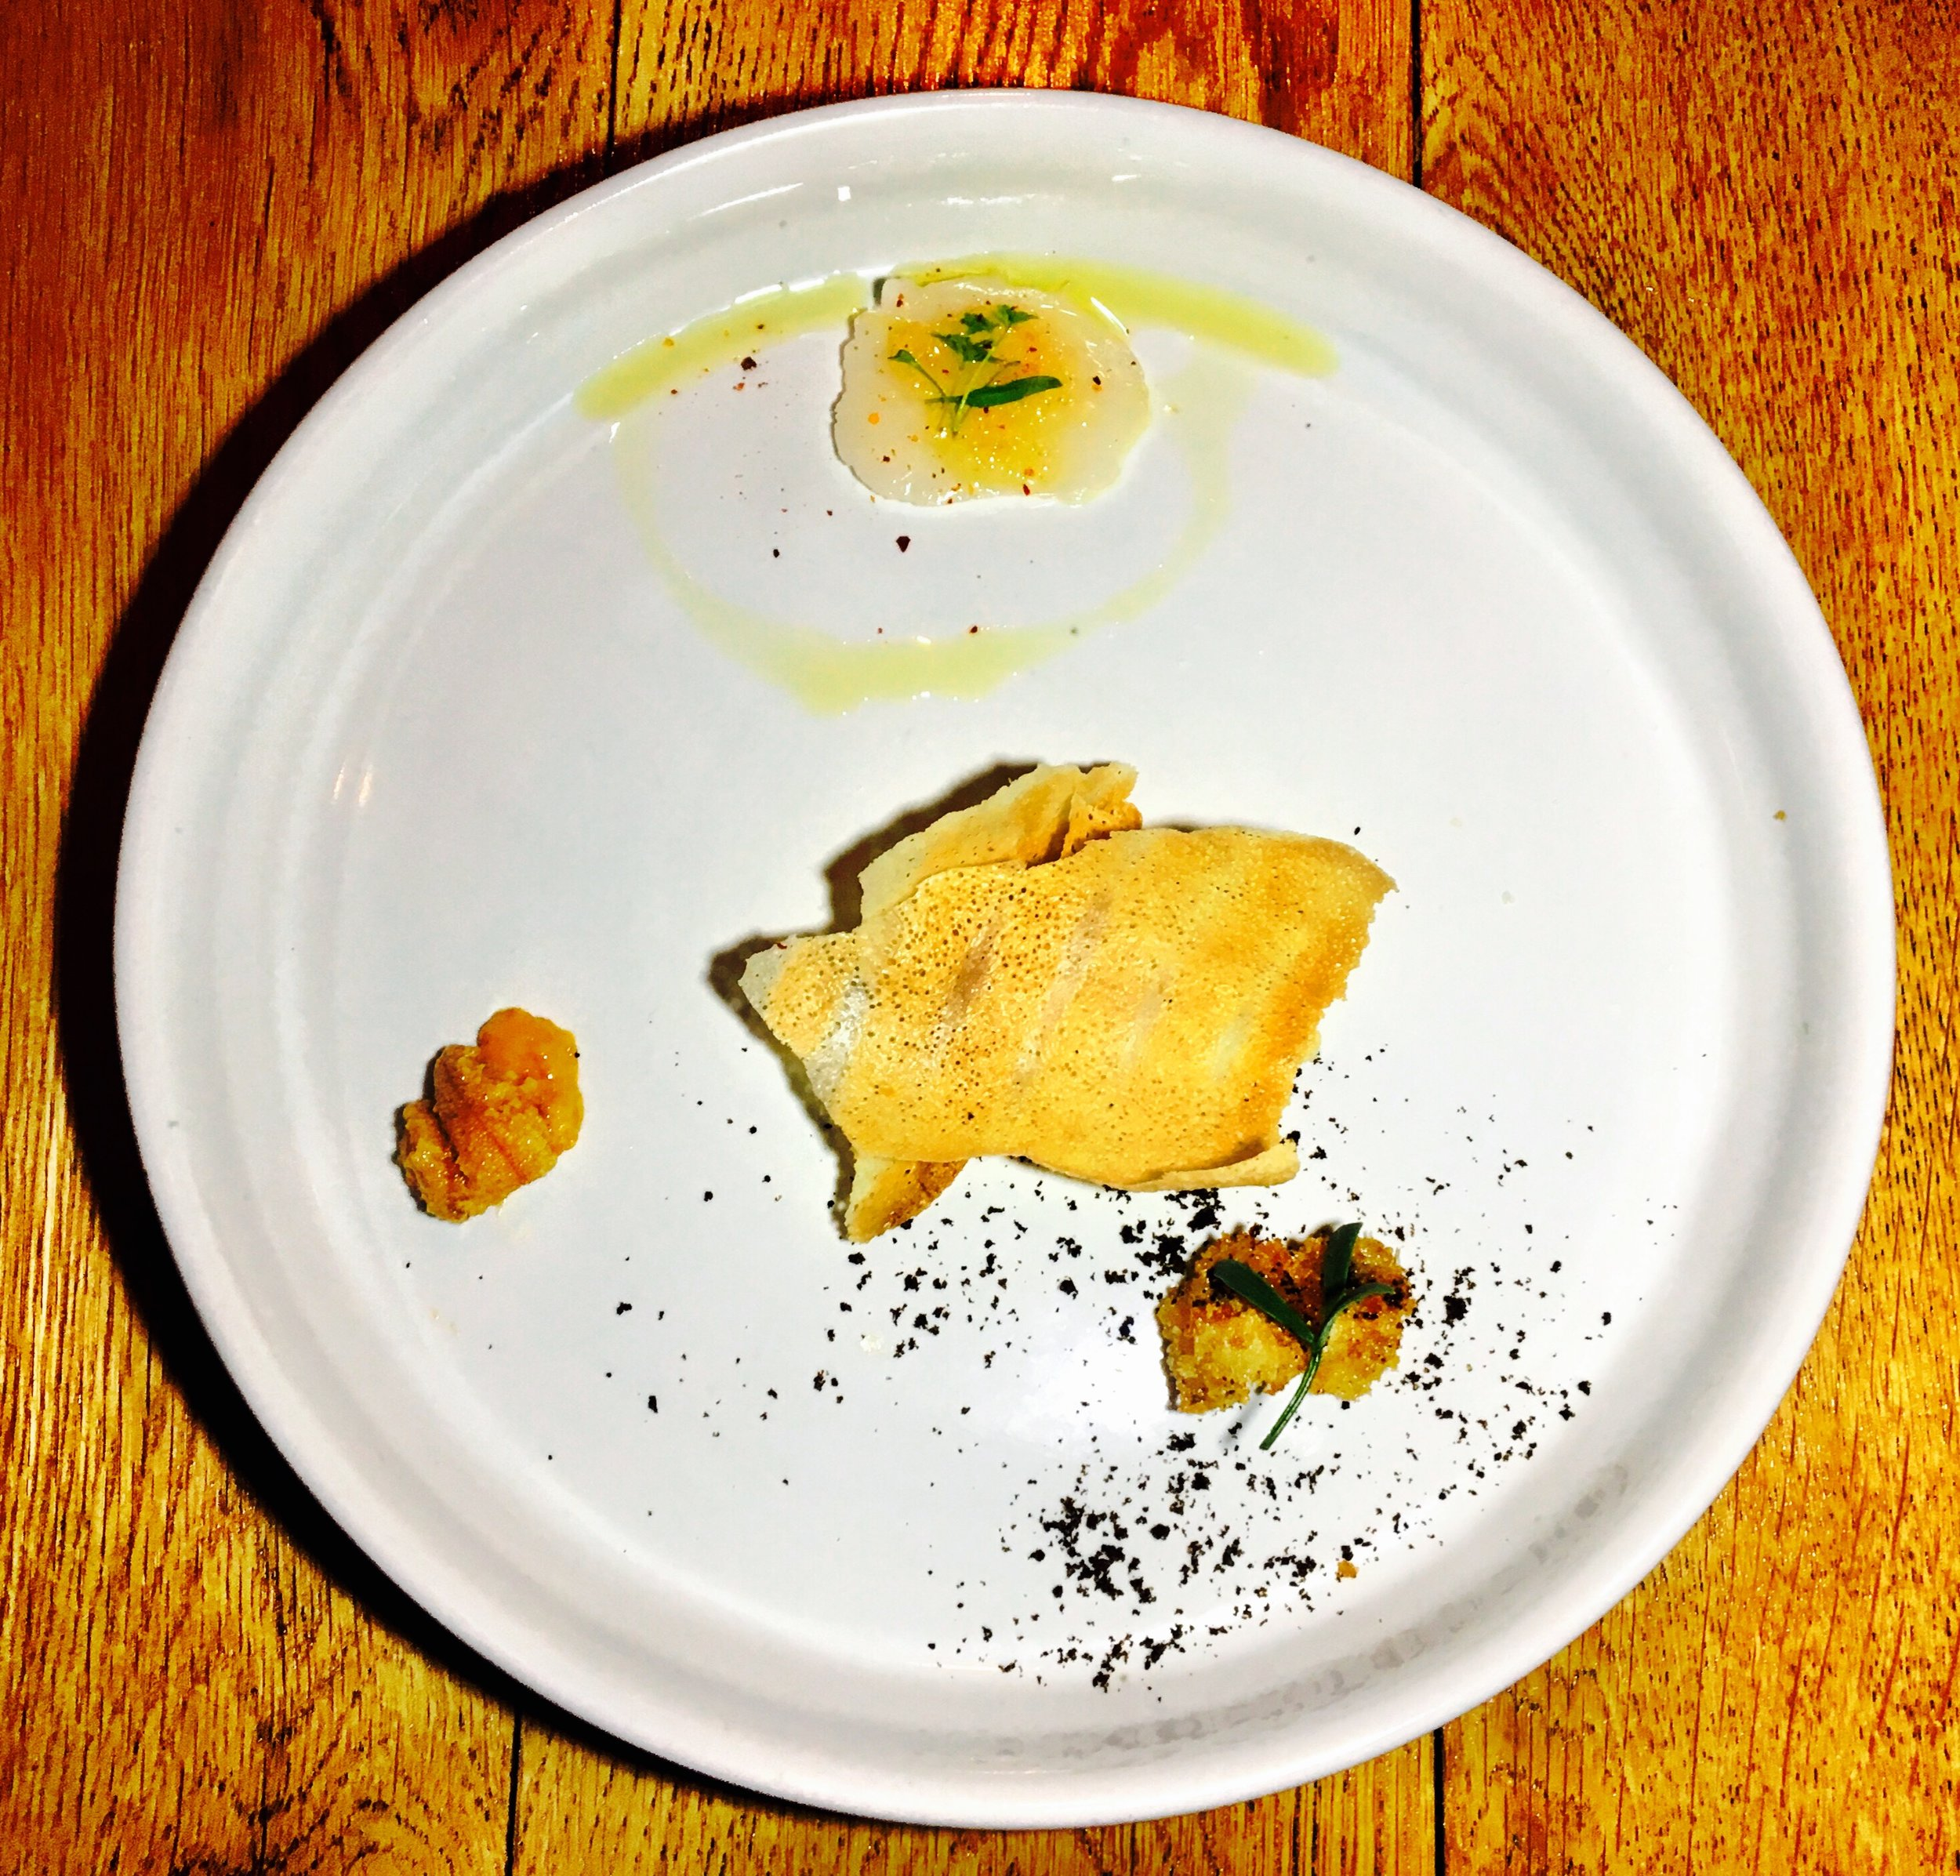 Amuse-Bouche - Fried Oyster, Scallop Ceviche and Sea Urchin